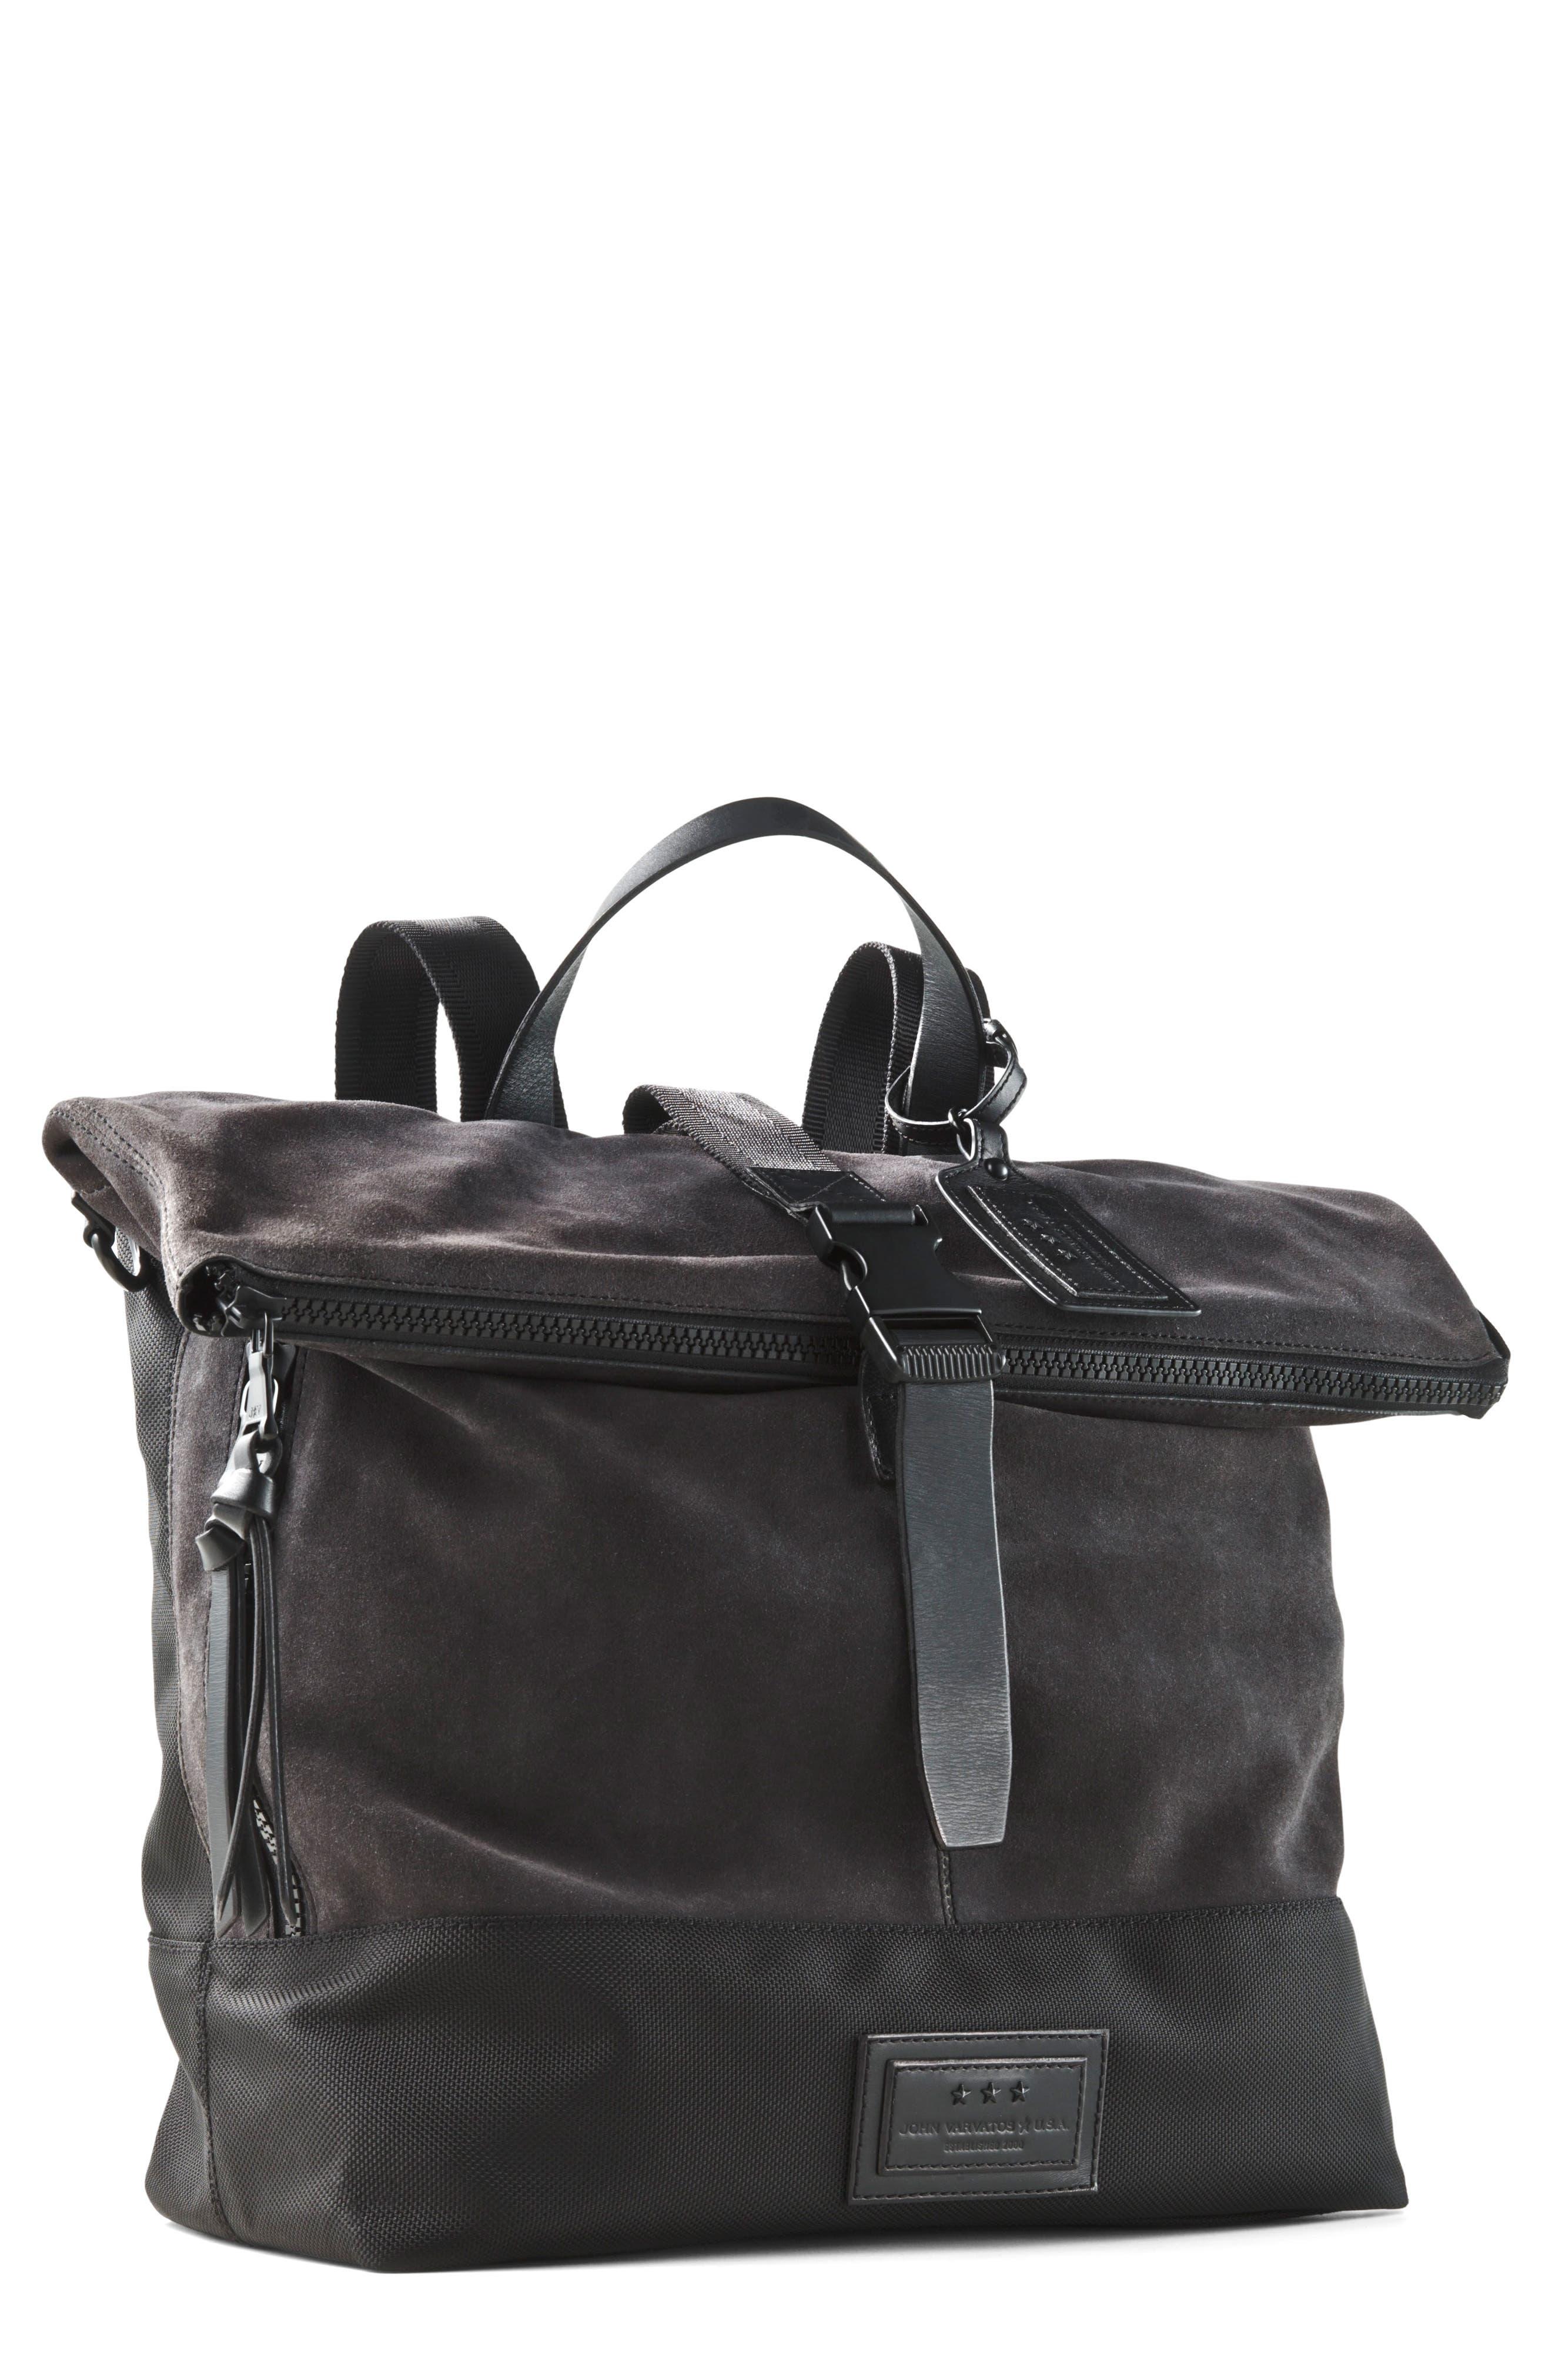 Suede & Ballistic Nylon Backpack,                             Main thumbnail 1, color,                             094